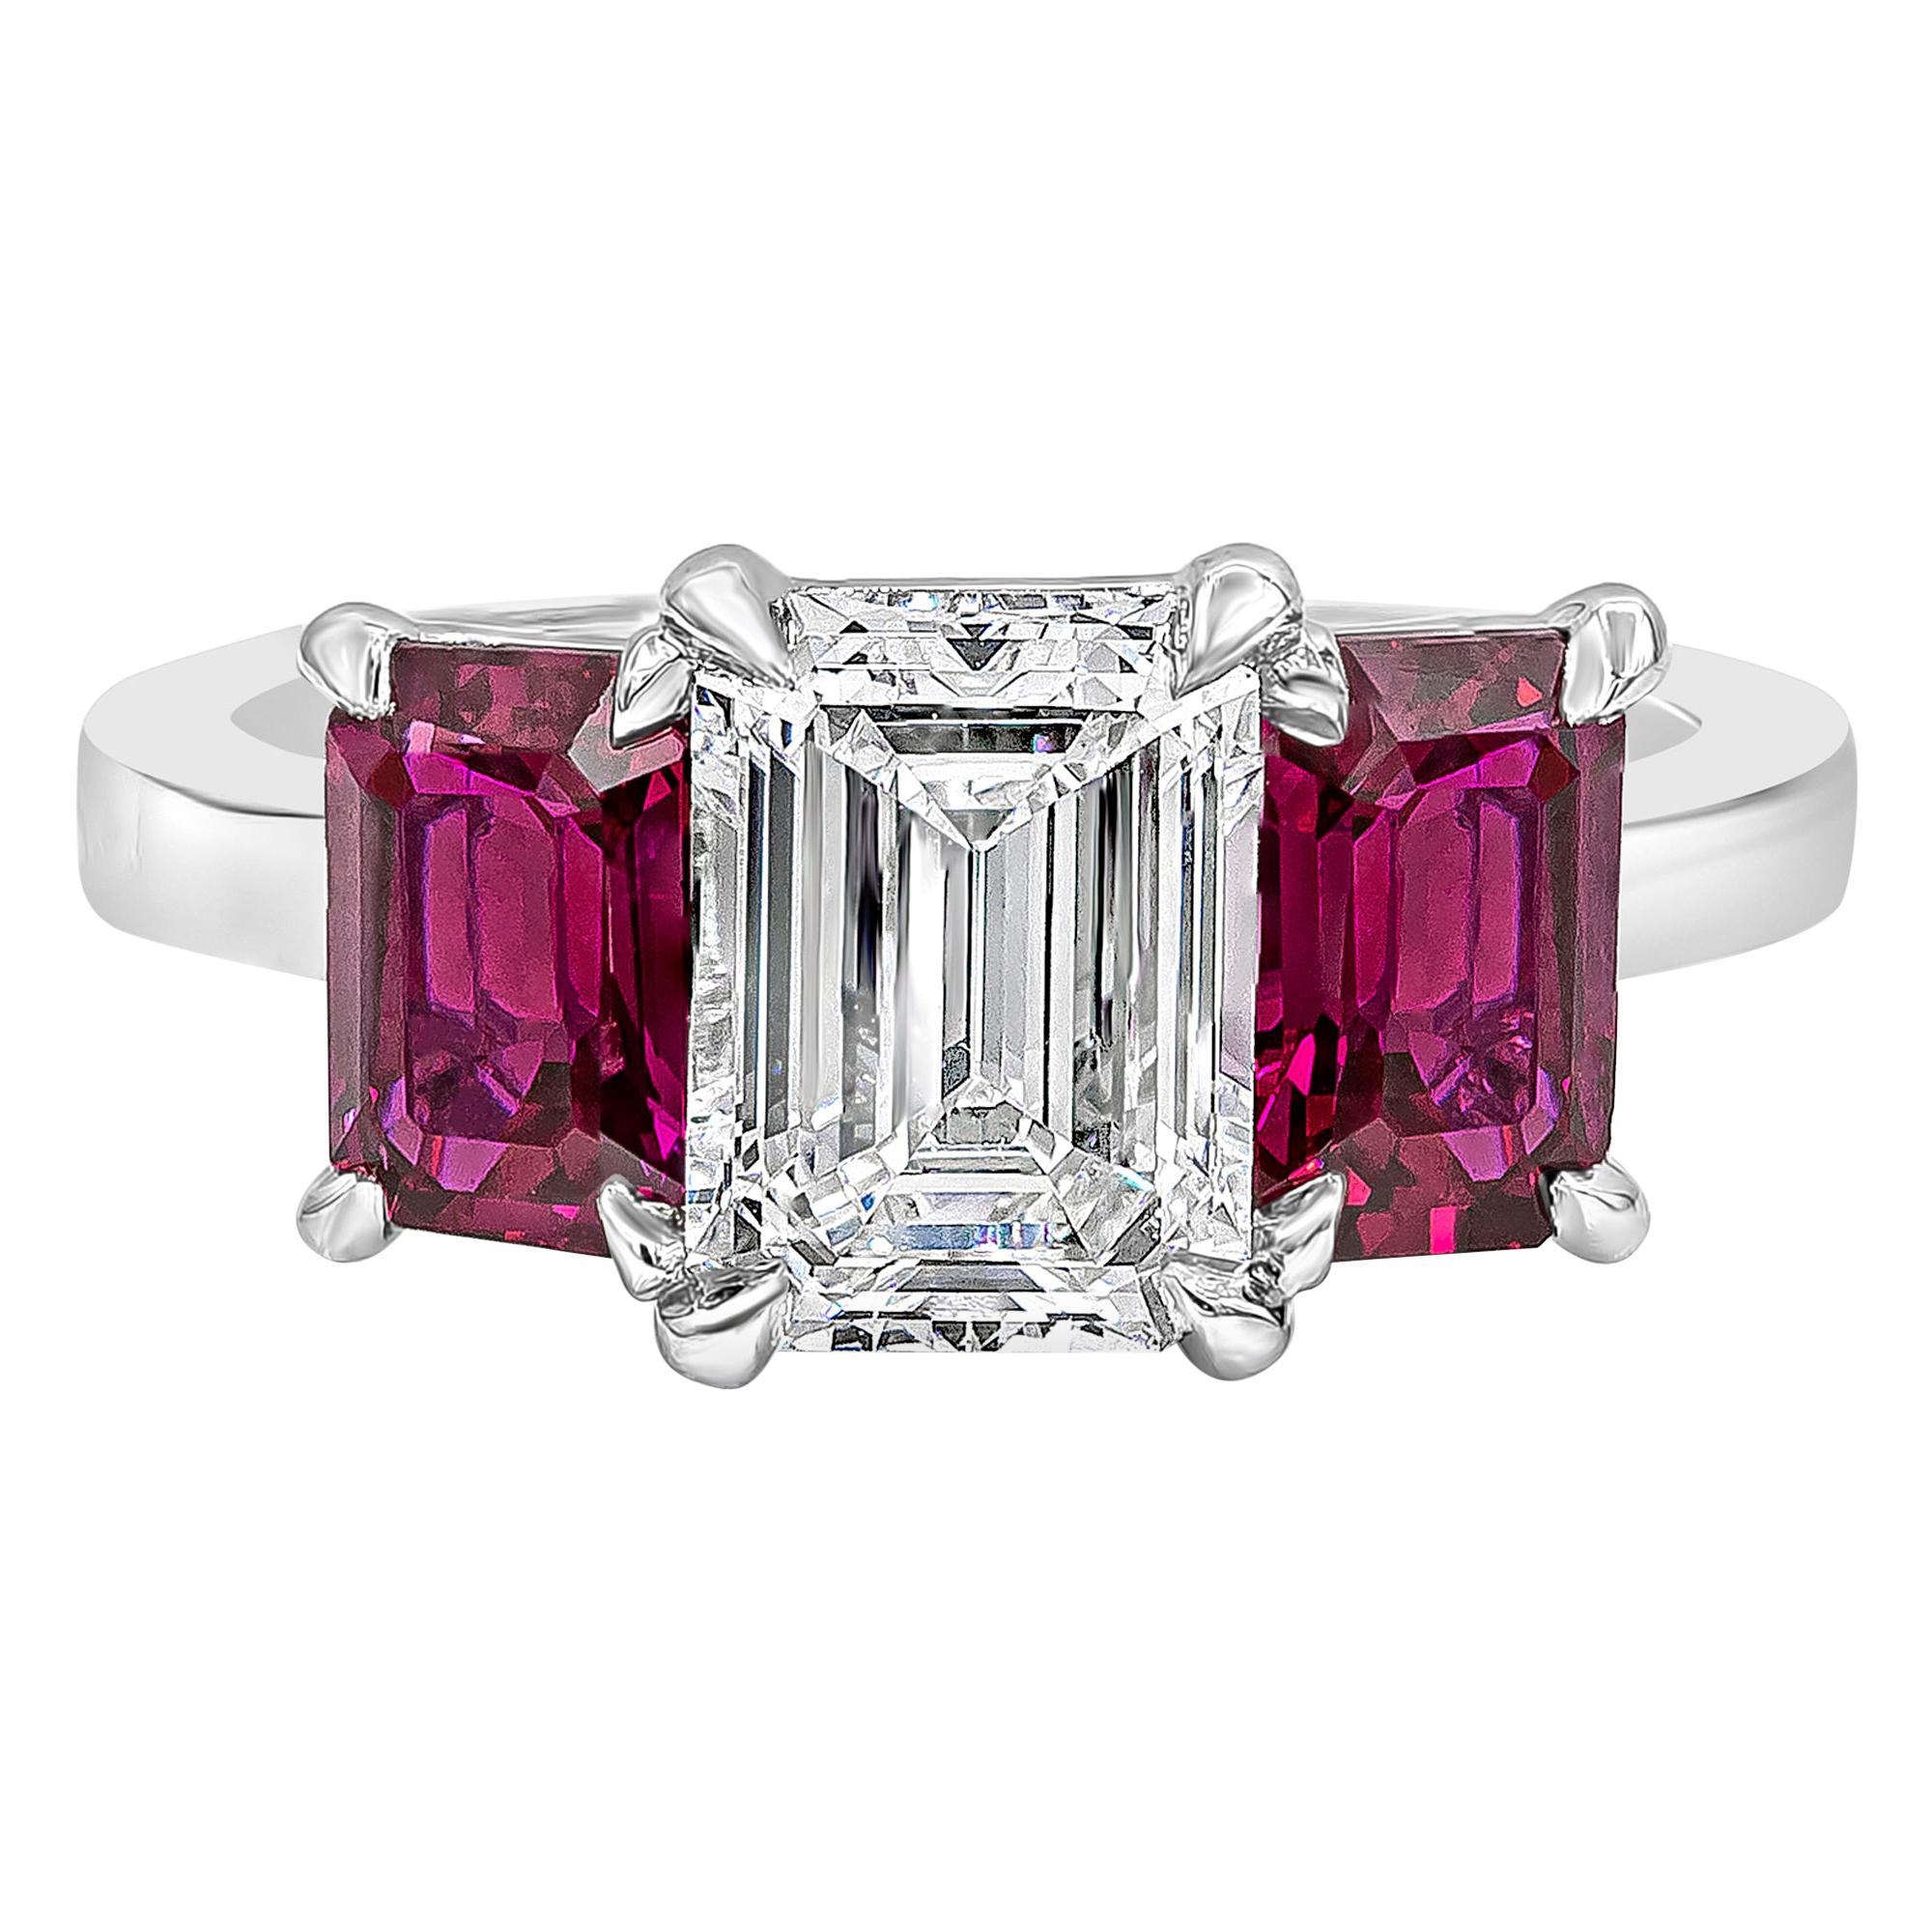 Roman Malakov, Emerald Cut Diamond and Ruby Three-Stone Engagement Ring